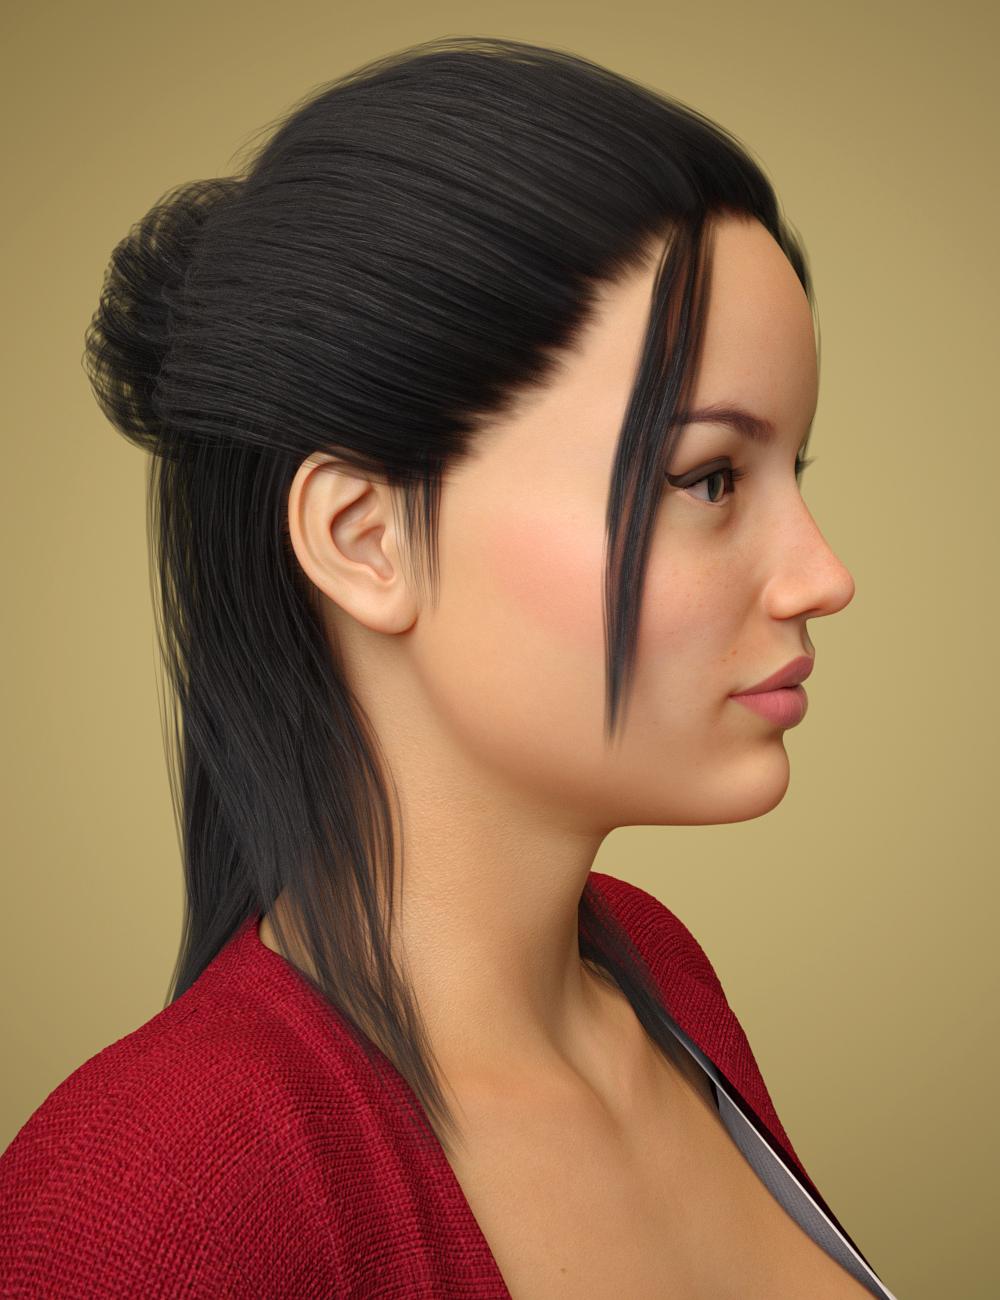 Tasha Hair for Genesis 8 Female(s) by: Toyen, 3D Models by Daz 3D